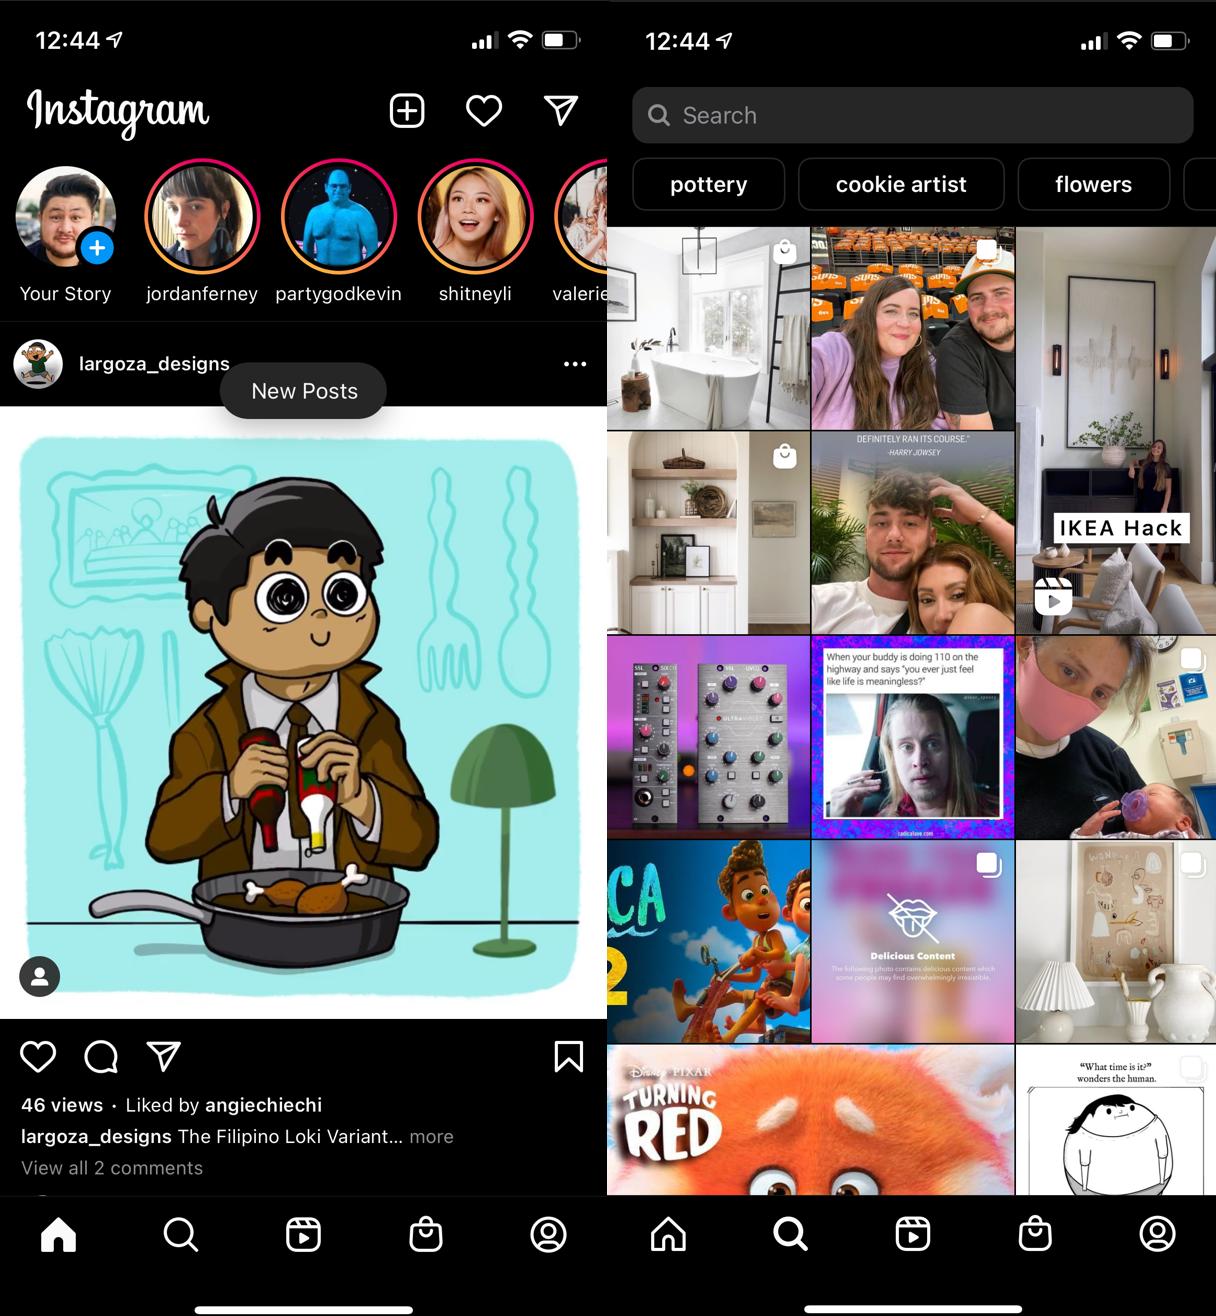 instagram application screenshots